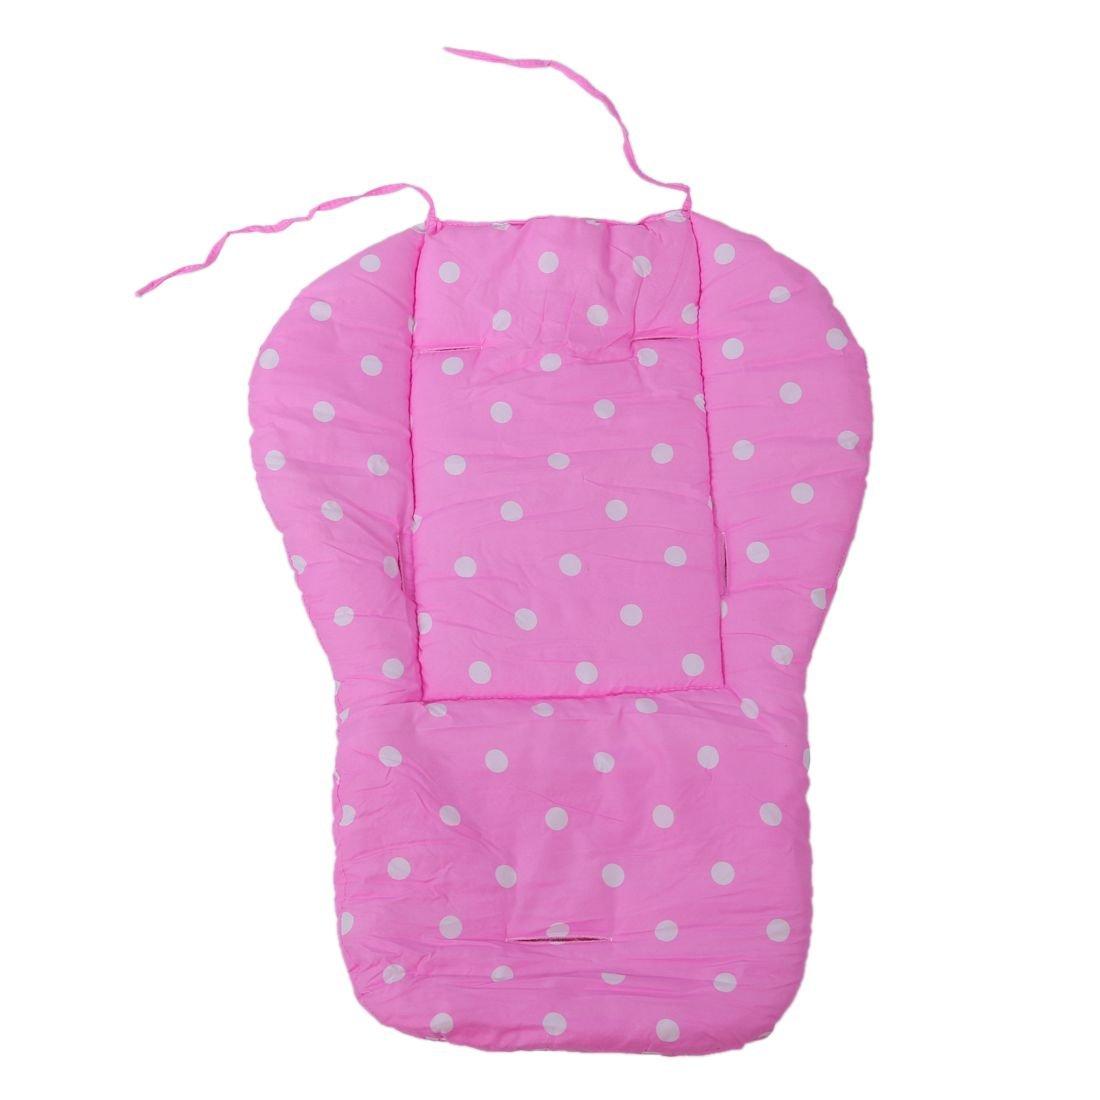 SODIAL R cojin de asiento de carrito de nino Funda de algodon almohada de asiento de grueso de cochecito infantil de bebe azul